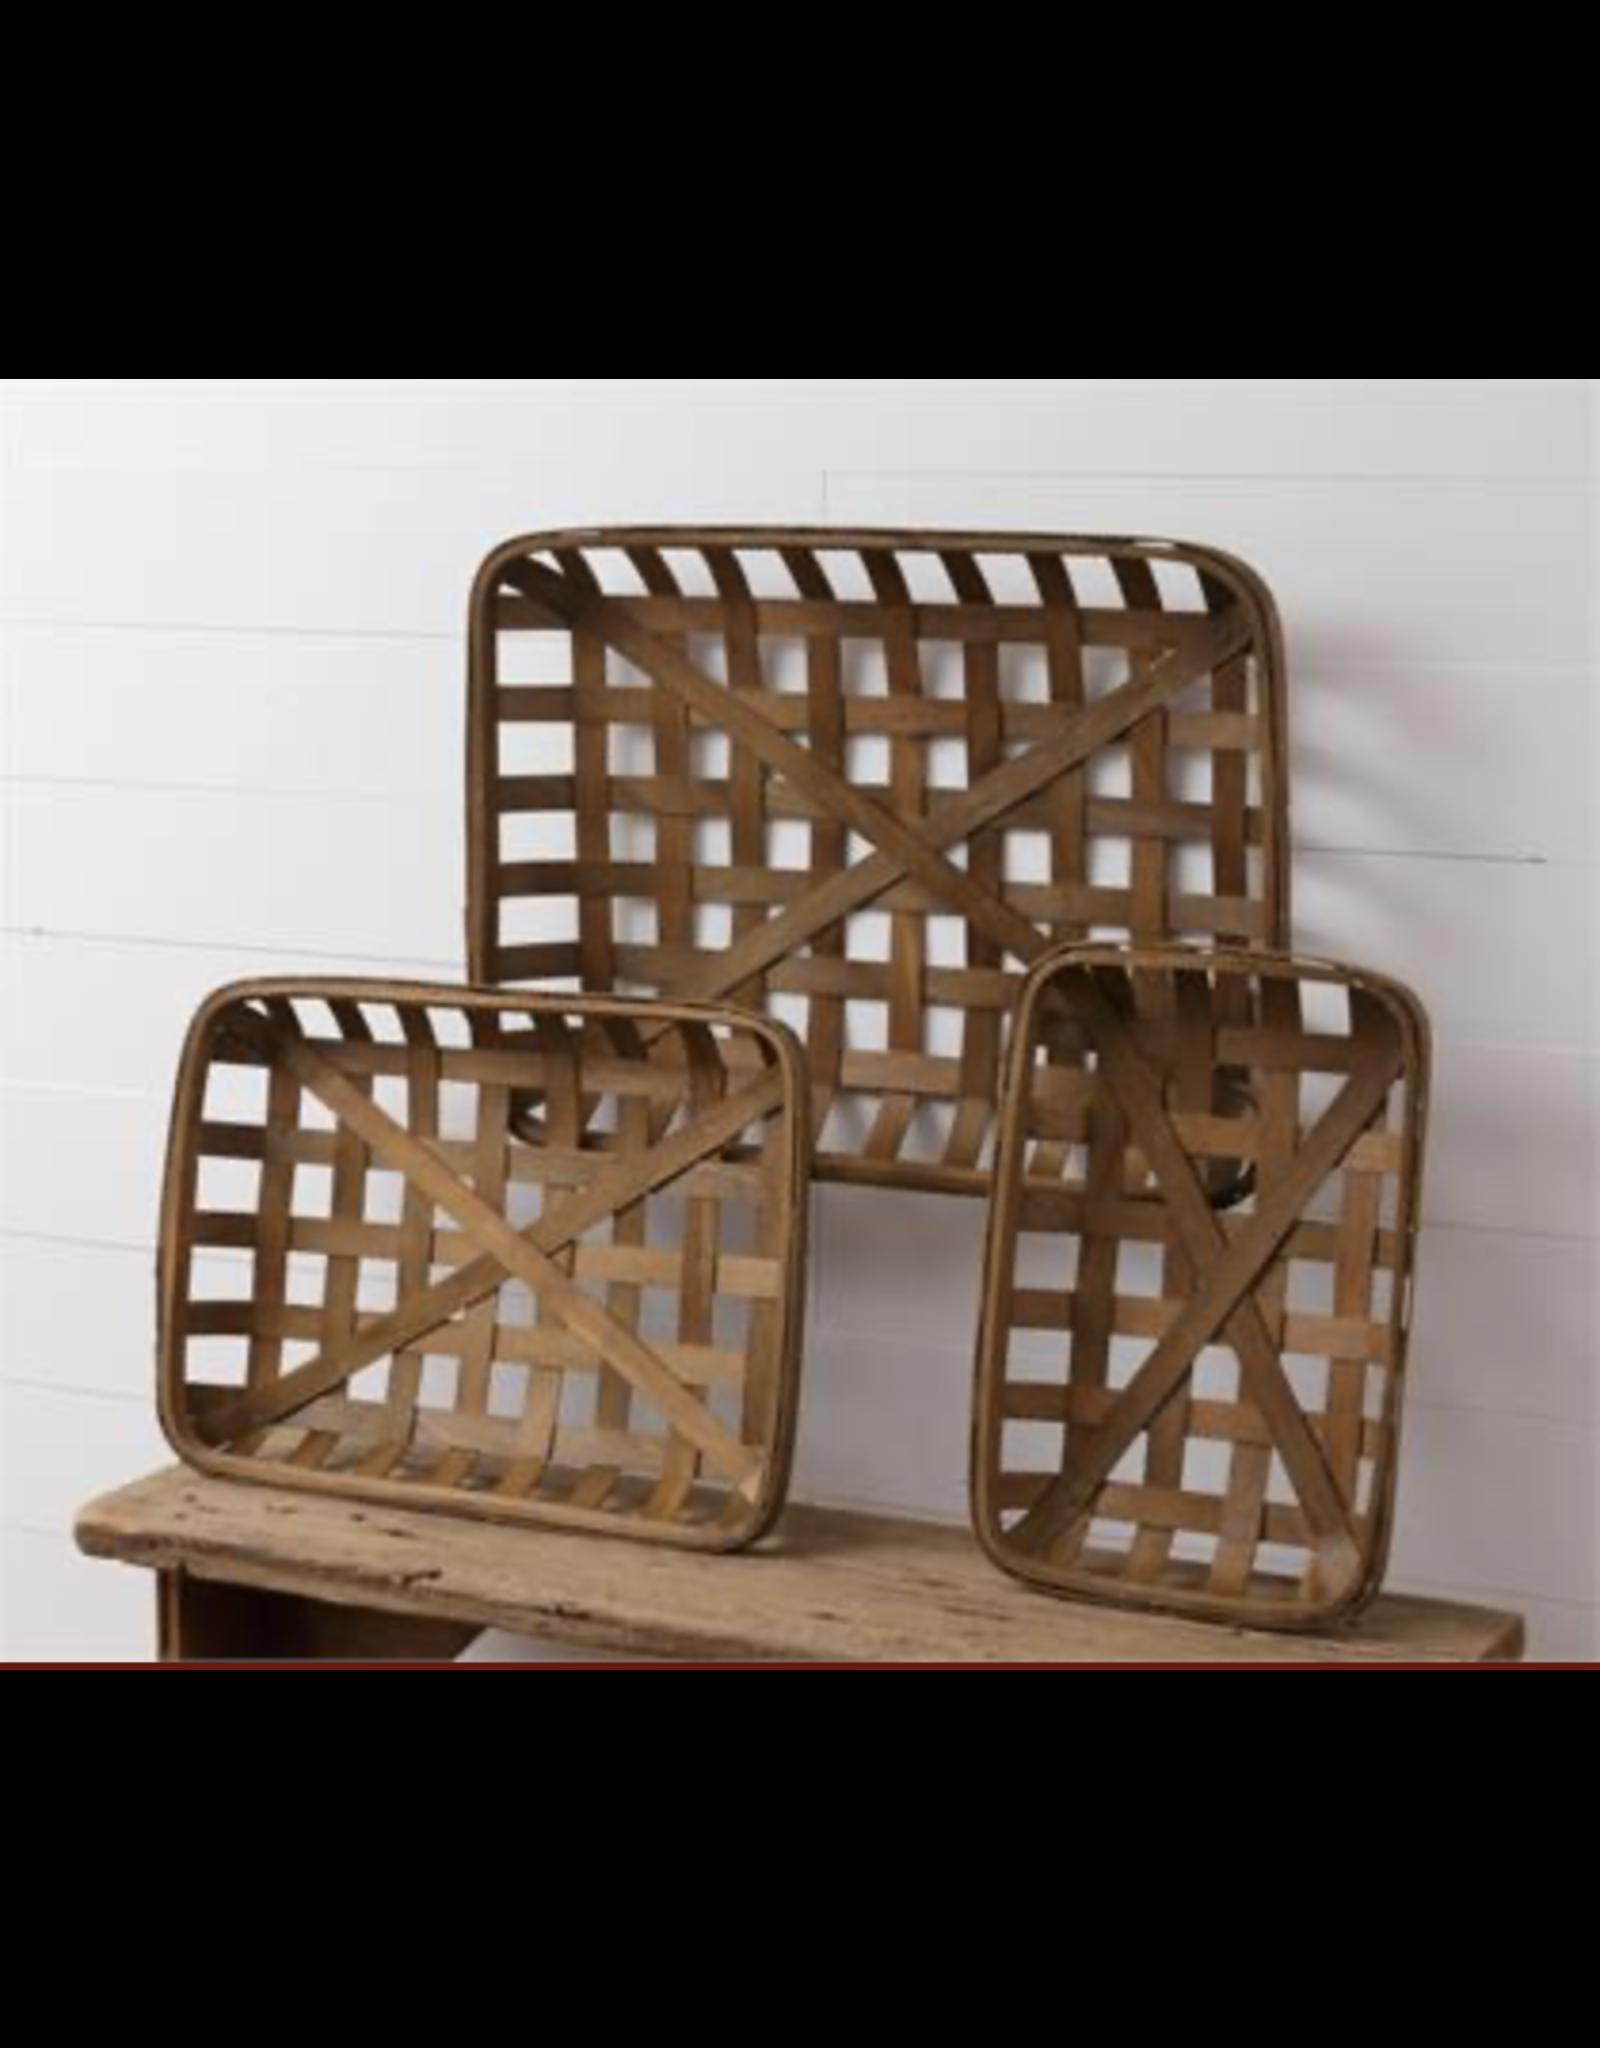 Audrey's Tobacco Rectangular Basket Medium